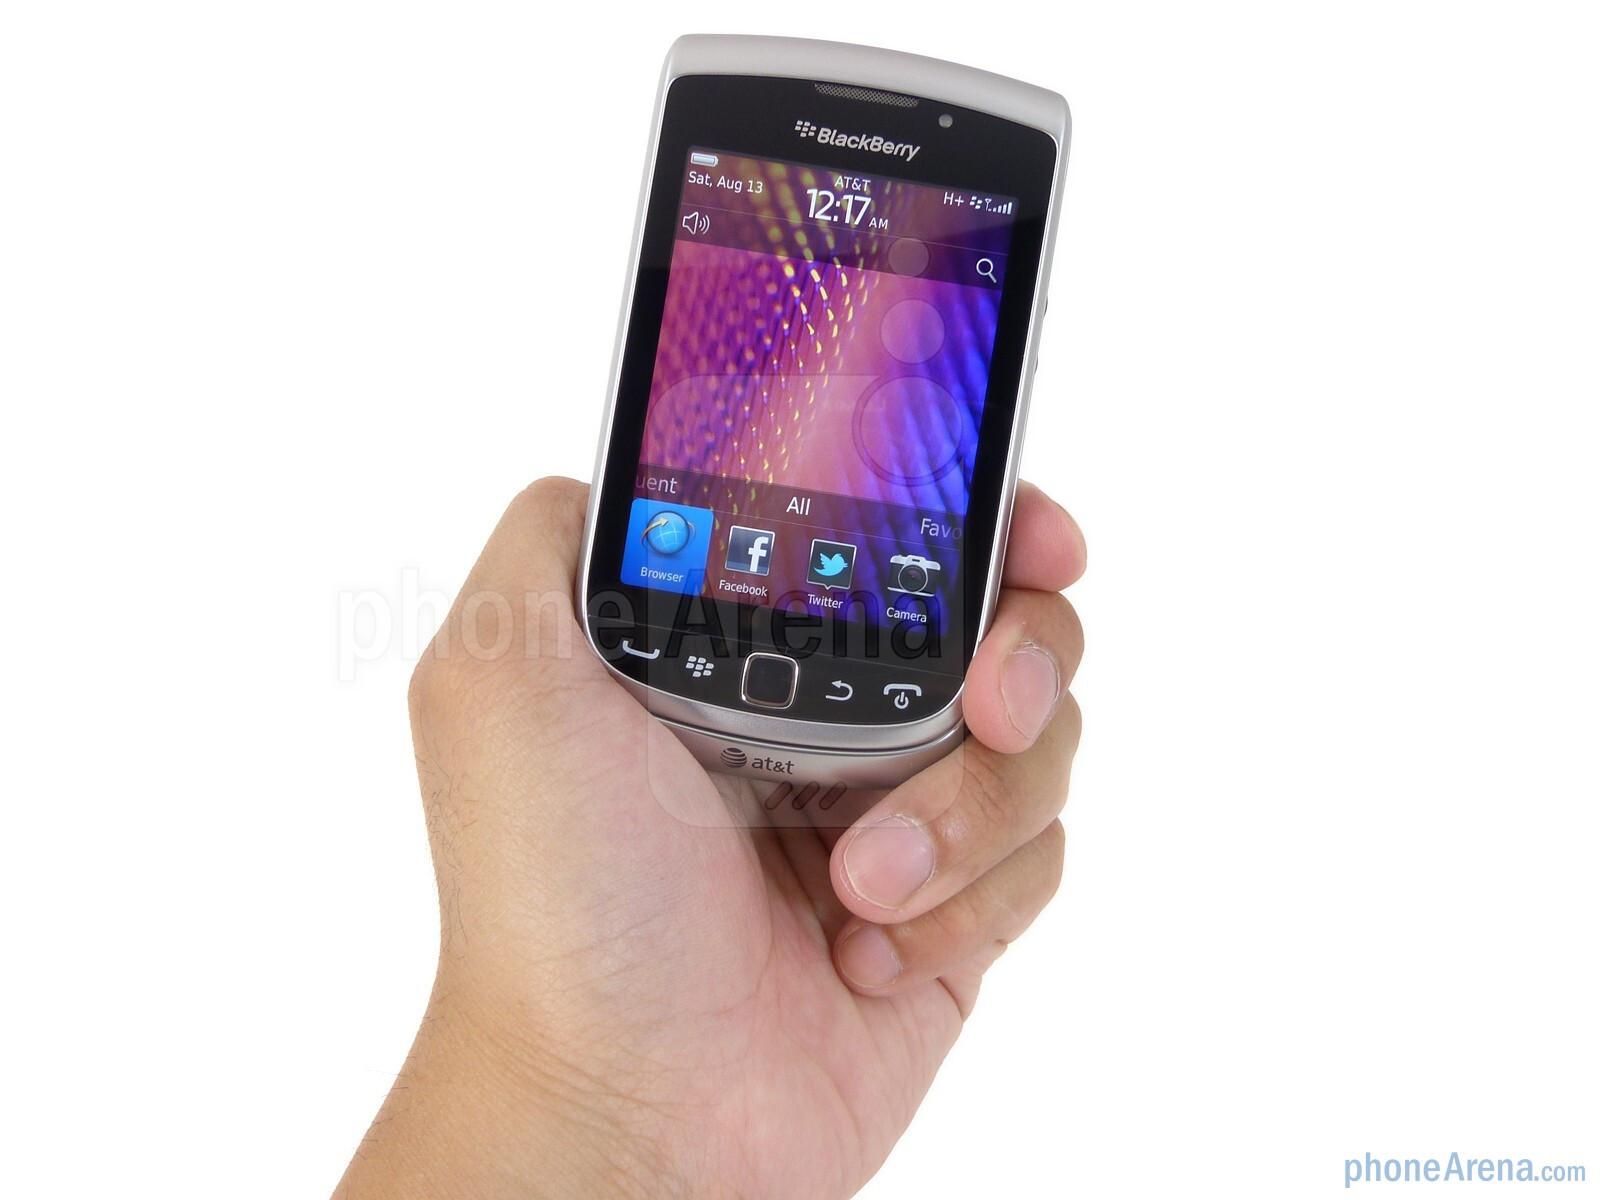 RIM BlackBerry Torch 9810 Review